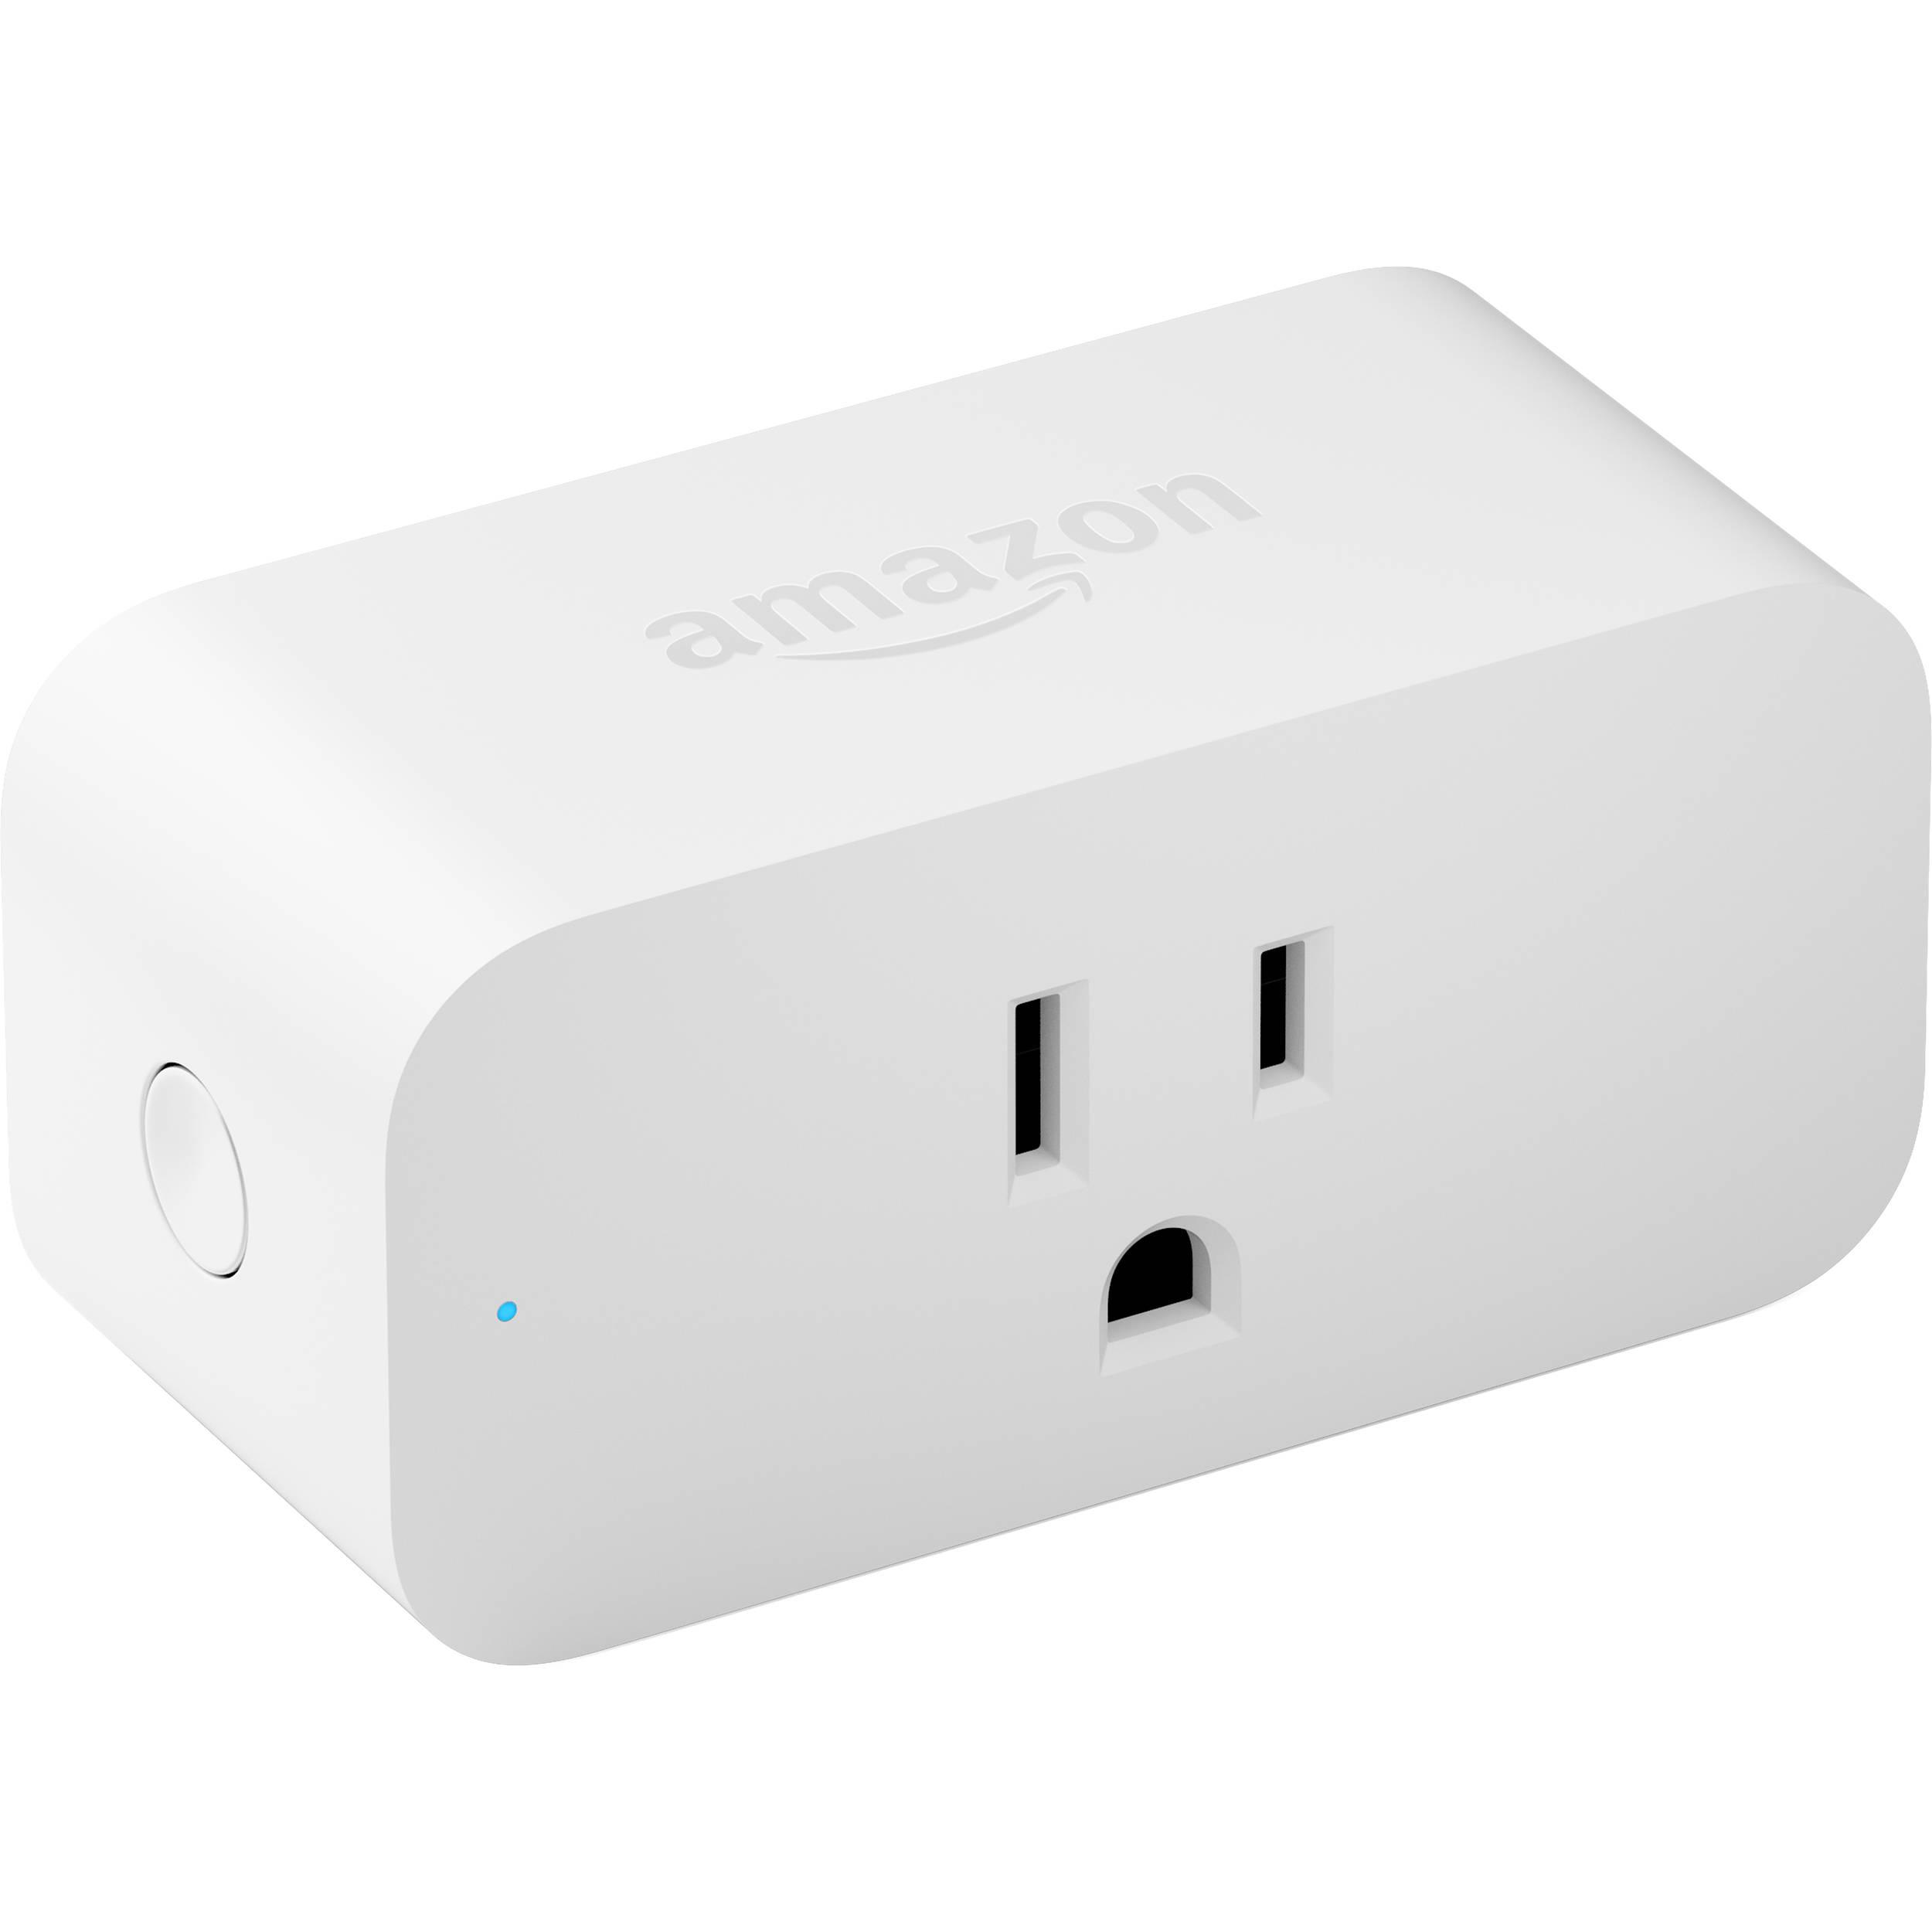 3 prong Single Socket White USA WiFi Smart Plug Works with Amazon Alexa